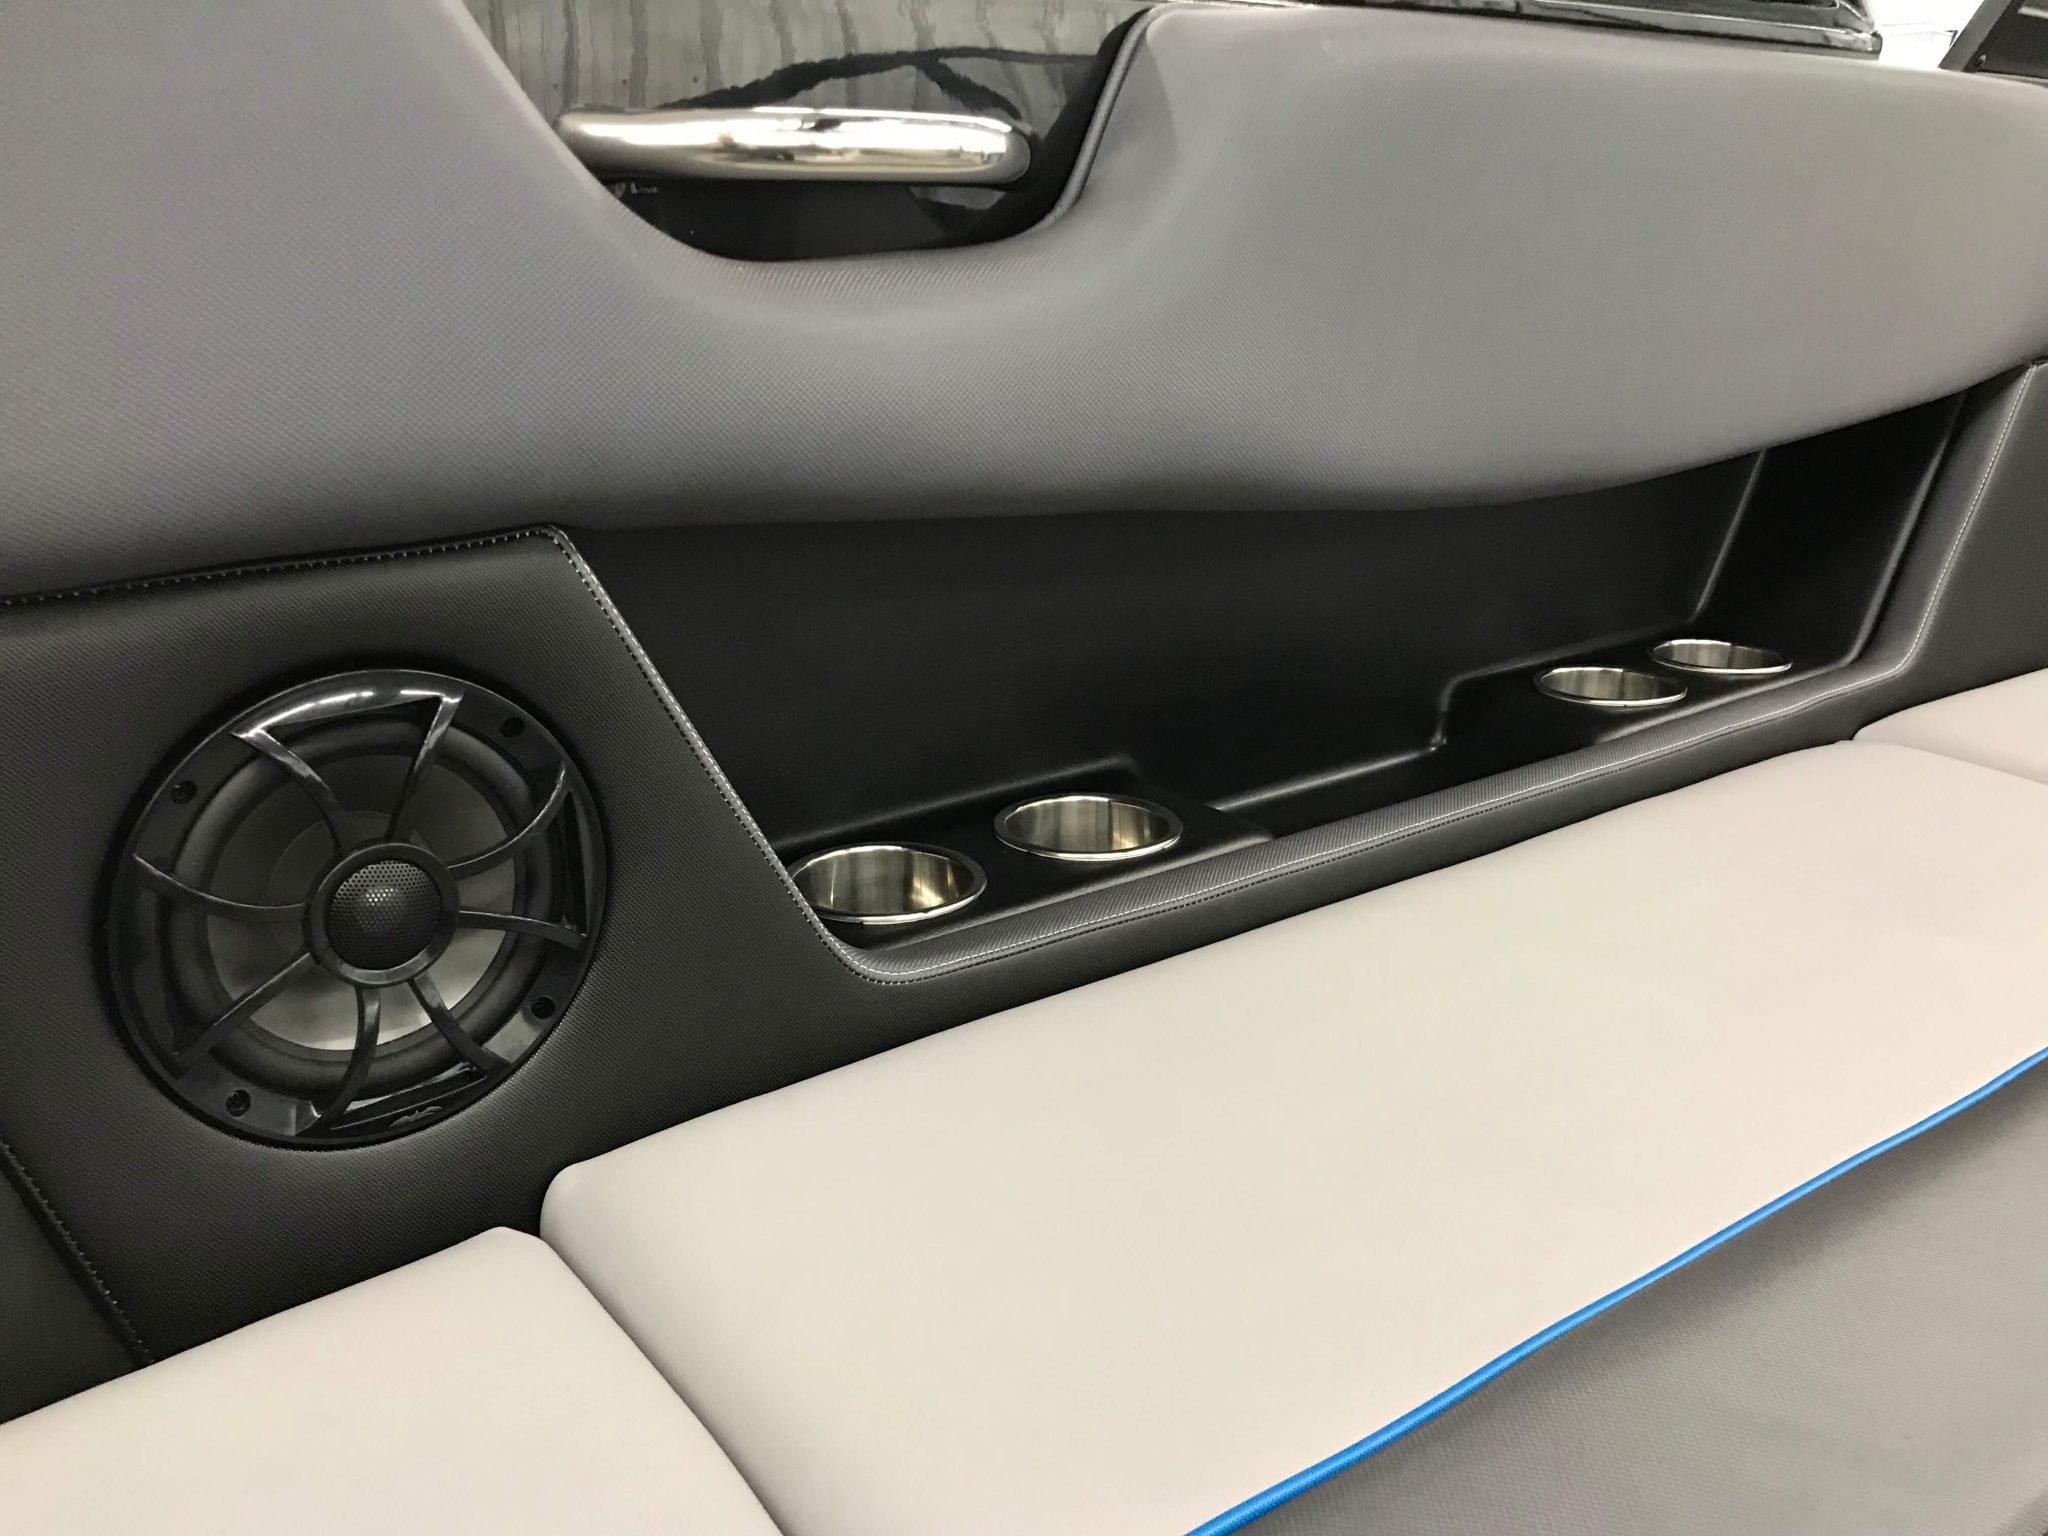 2019 Moomba Max Wetsounds Cockpit Speakers 1